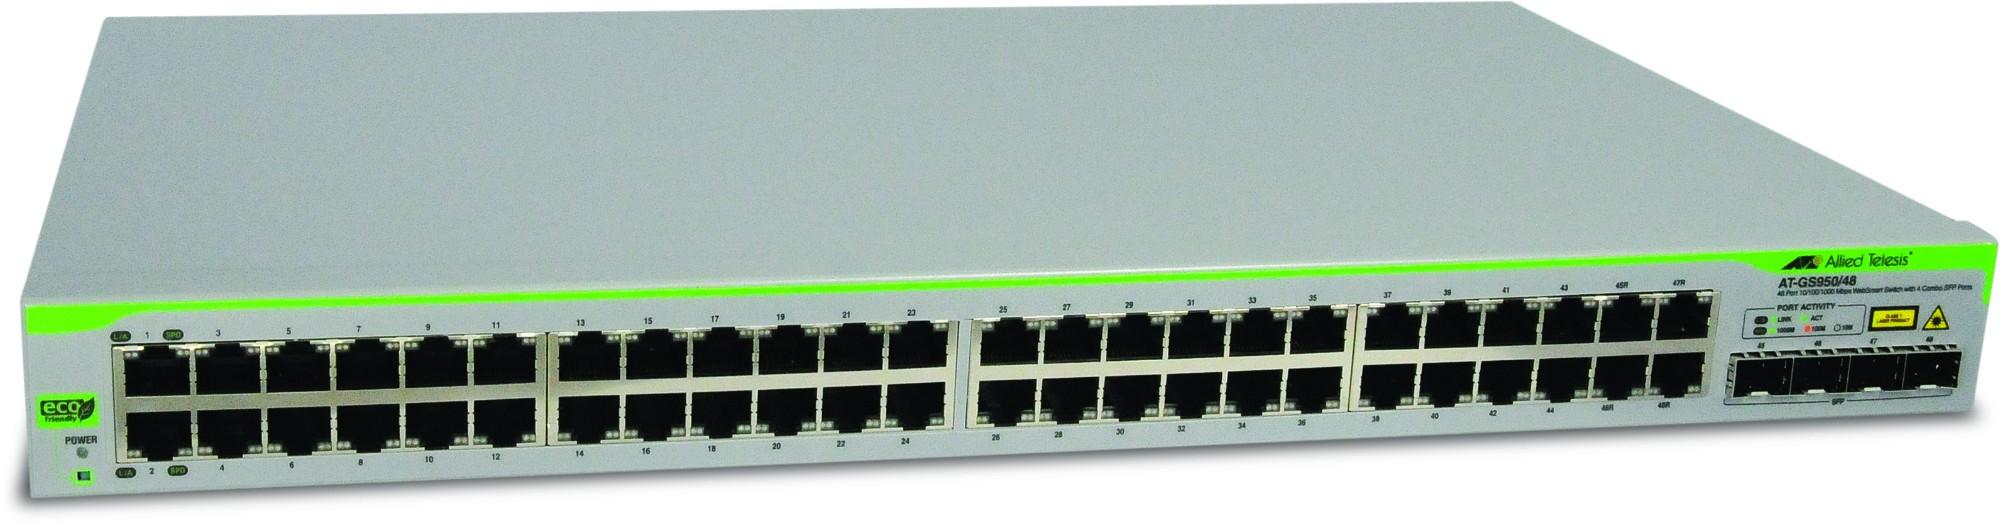 Allied Telesis AT-GS950/48-50 Gestionado L2 Gigabit Ethernet (10/100/1000) Gris 1U